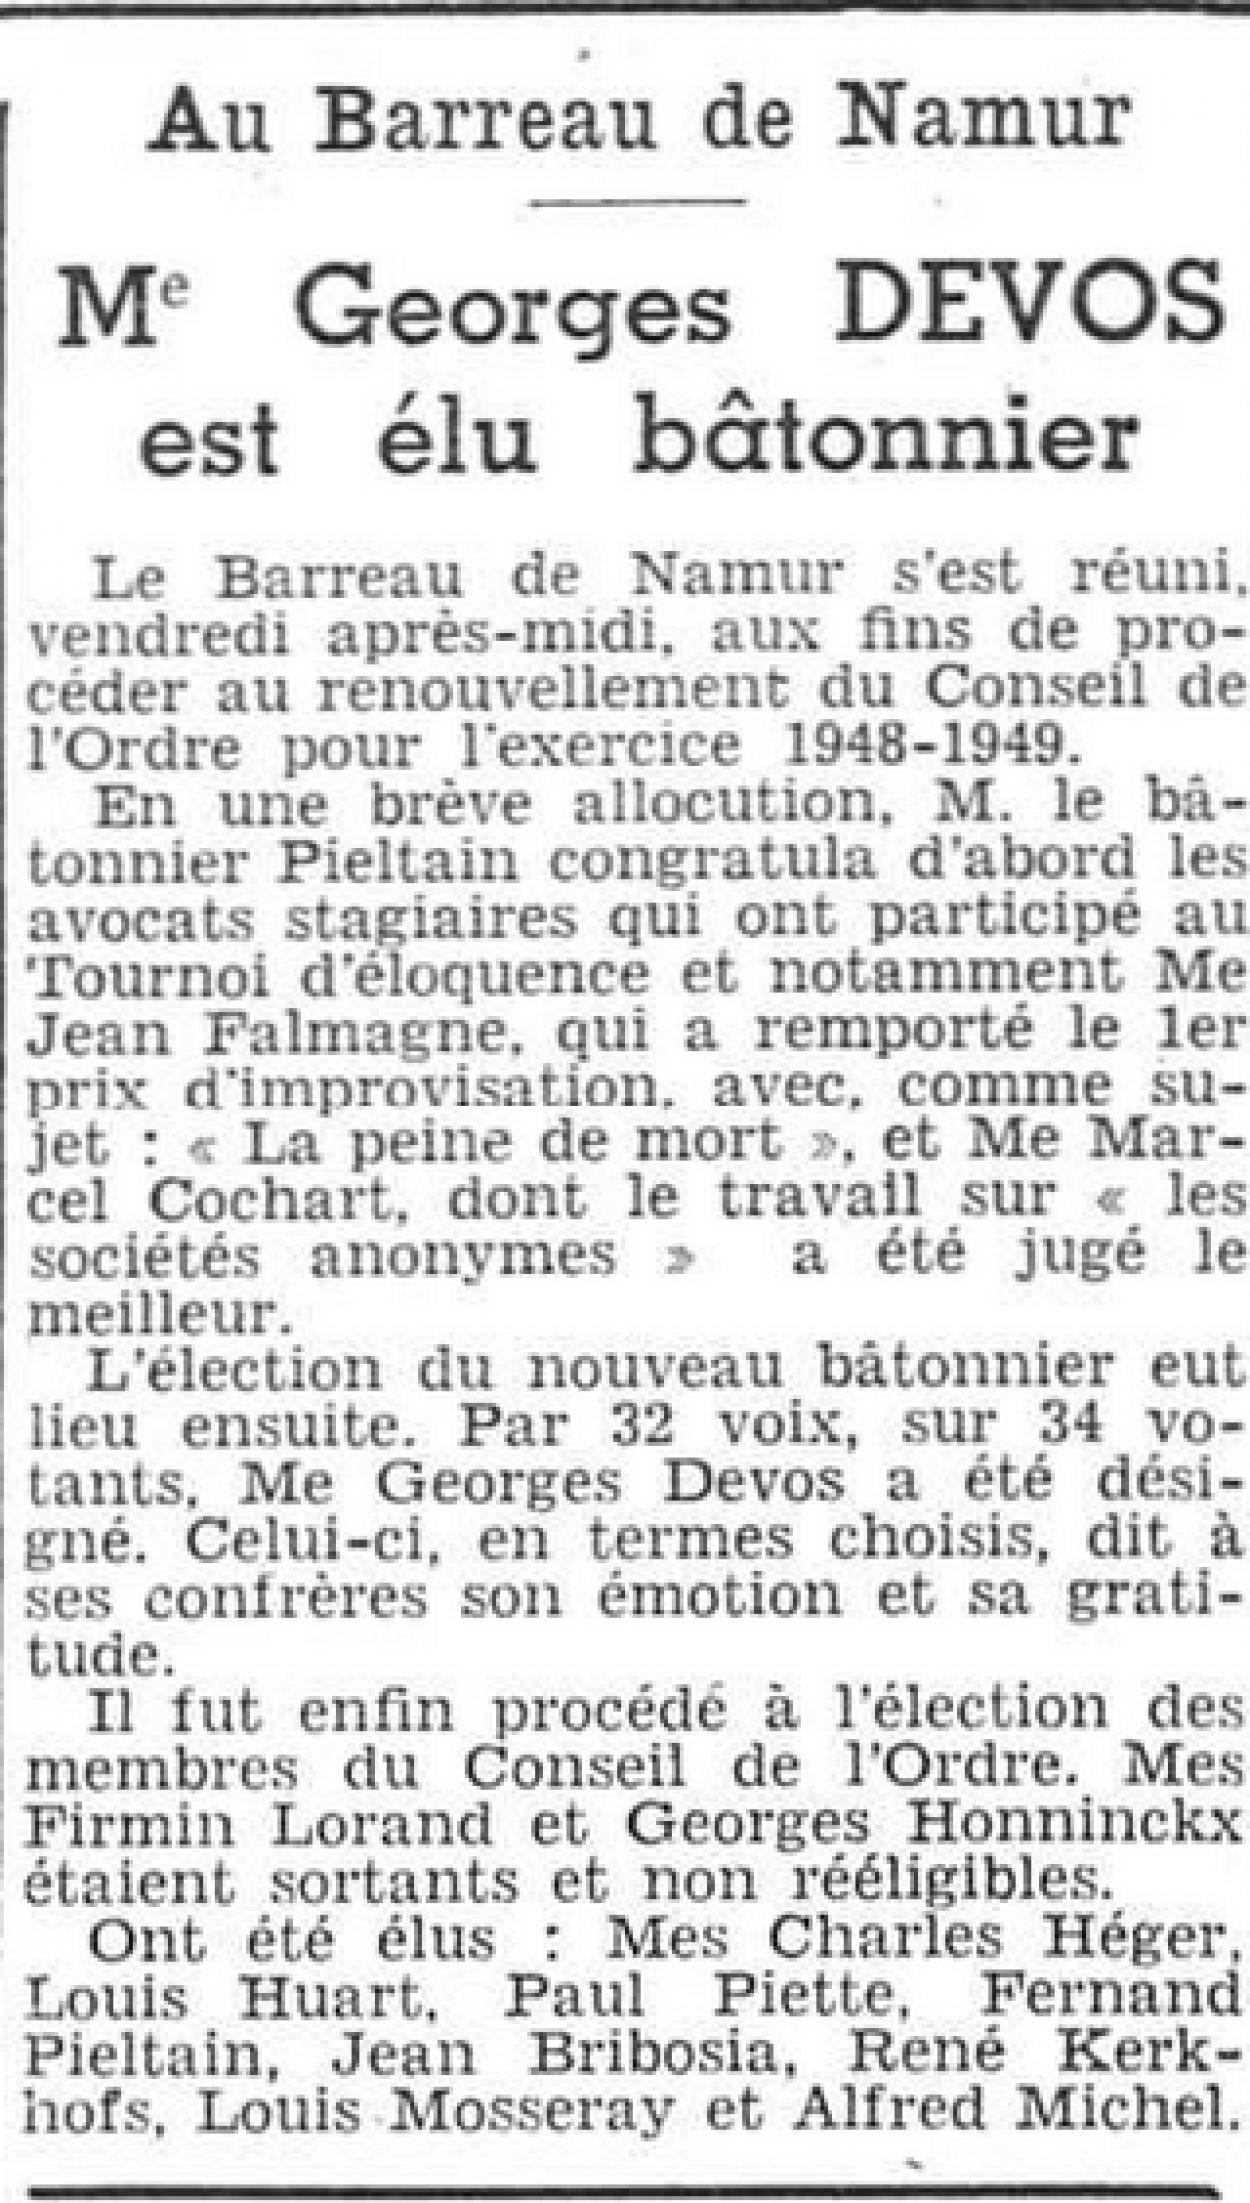 vers-l-avenir-10-7-1948-p-3.png